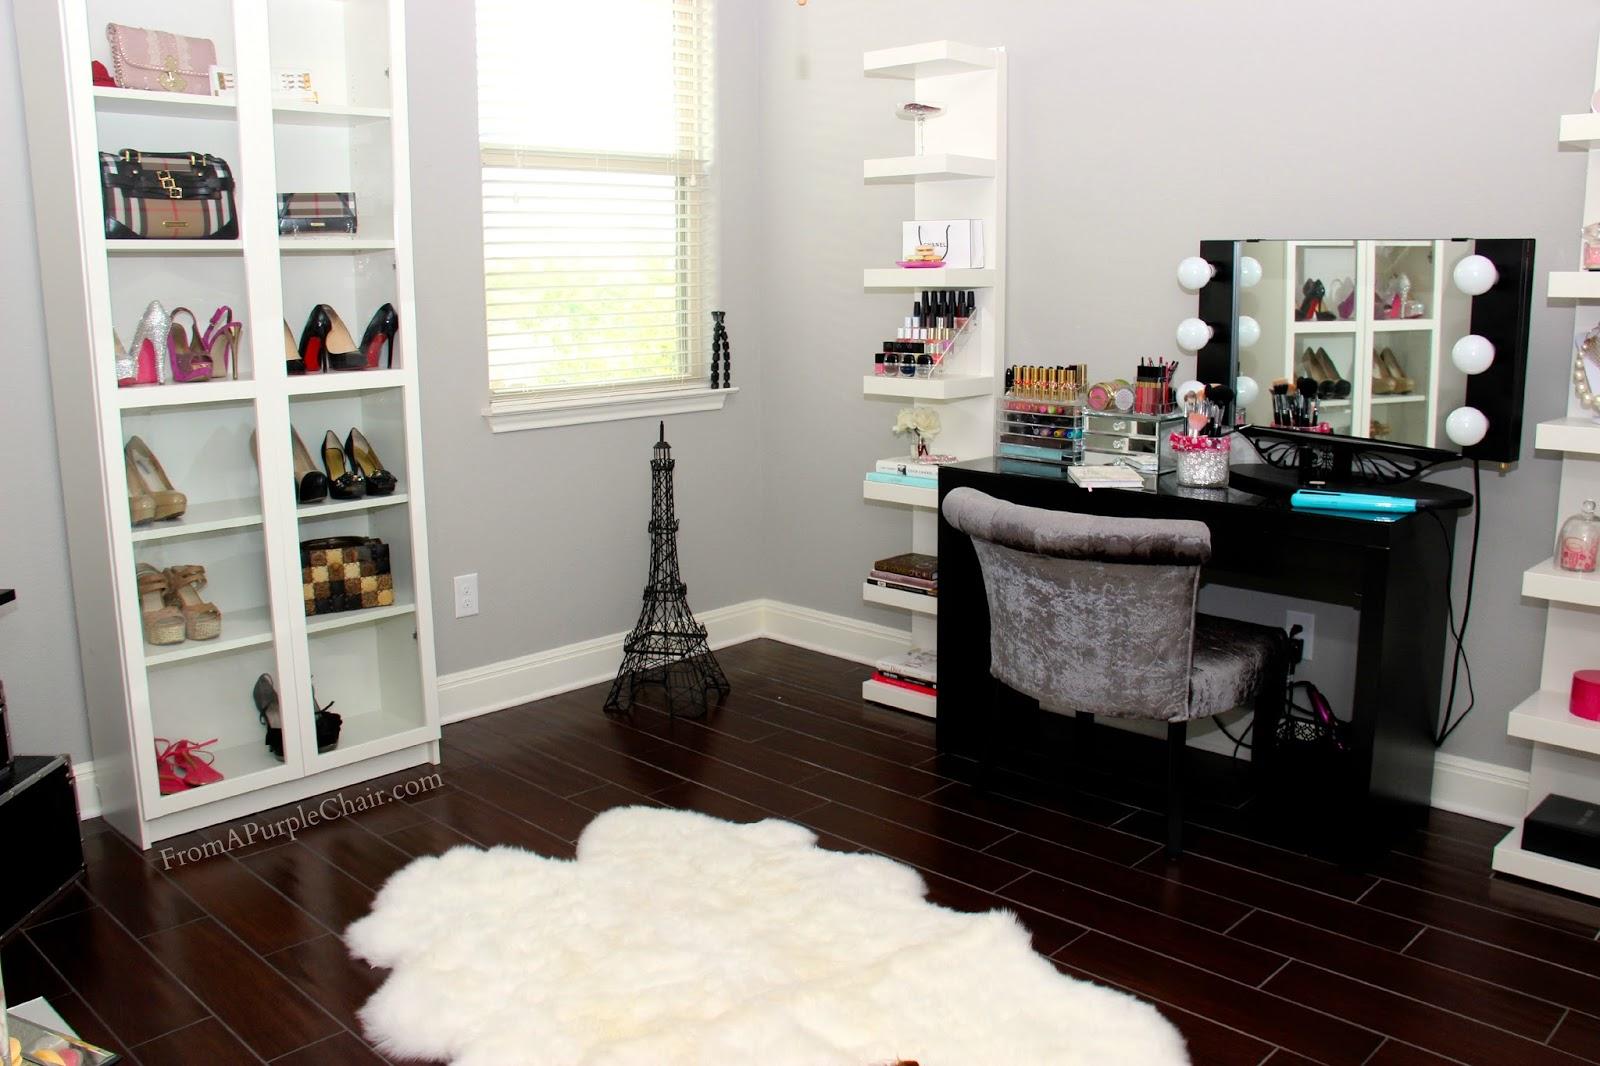 Miss Liz Heart: Makeup Room/Beauty Room Set Up (Before)